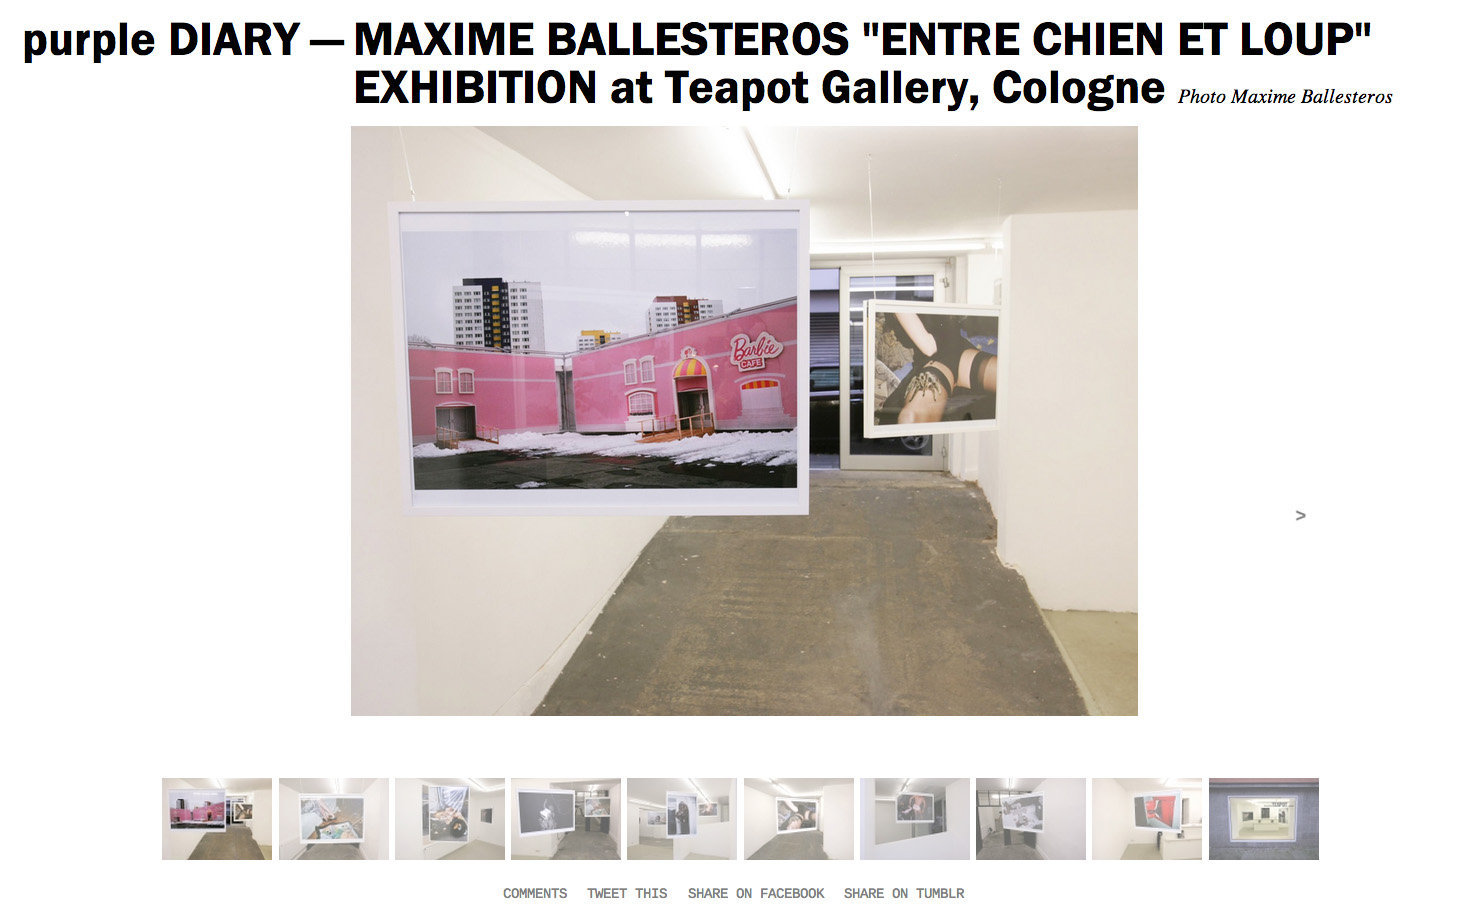 purple DIARY   MAXIME BALLESTEROS  ENTRE CHIEN ET LOUP  EXHIBITION at Teapot Gallery  Cologne.jpg